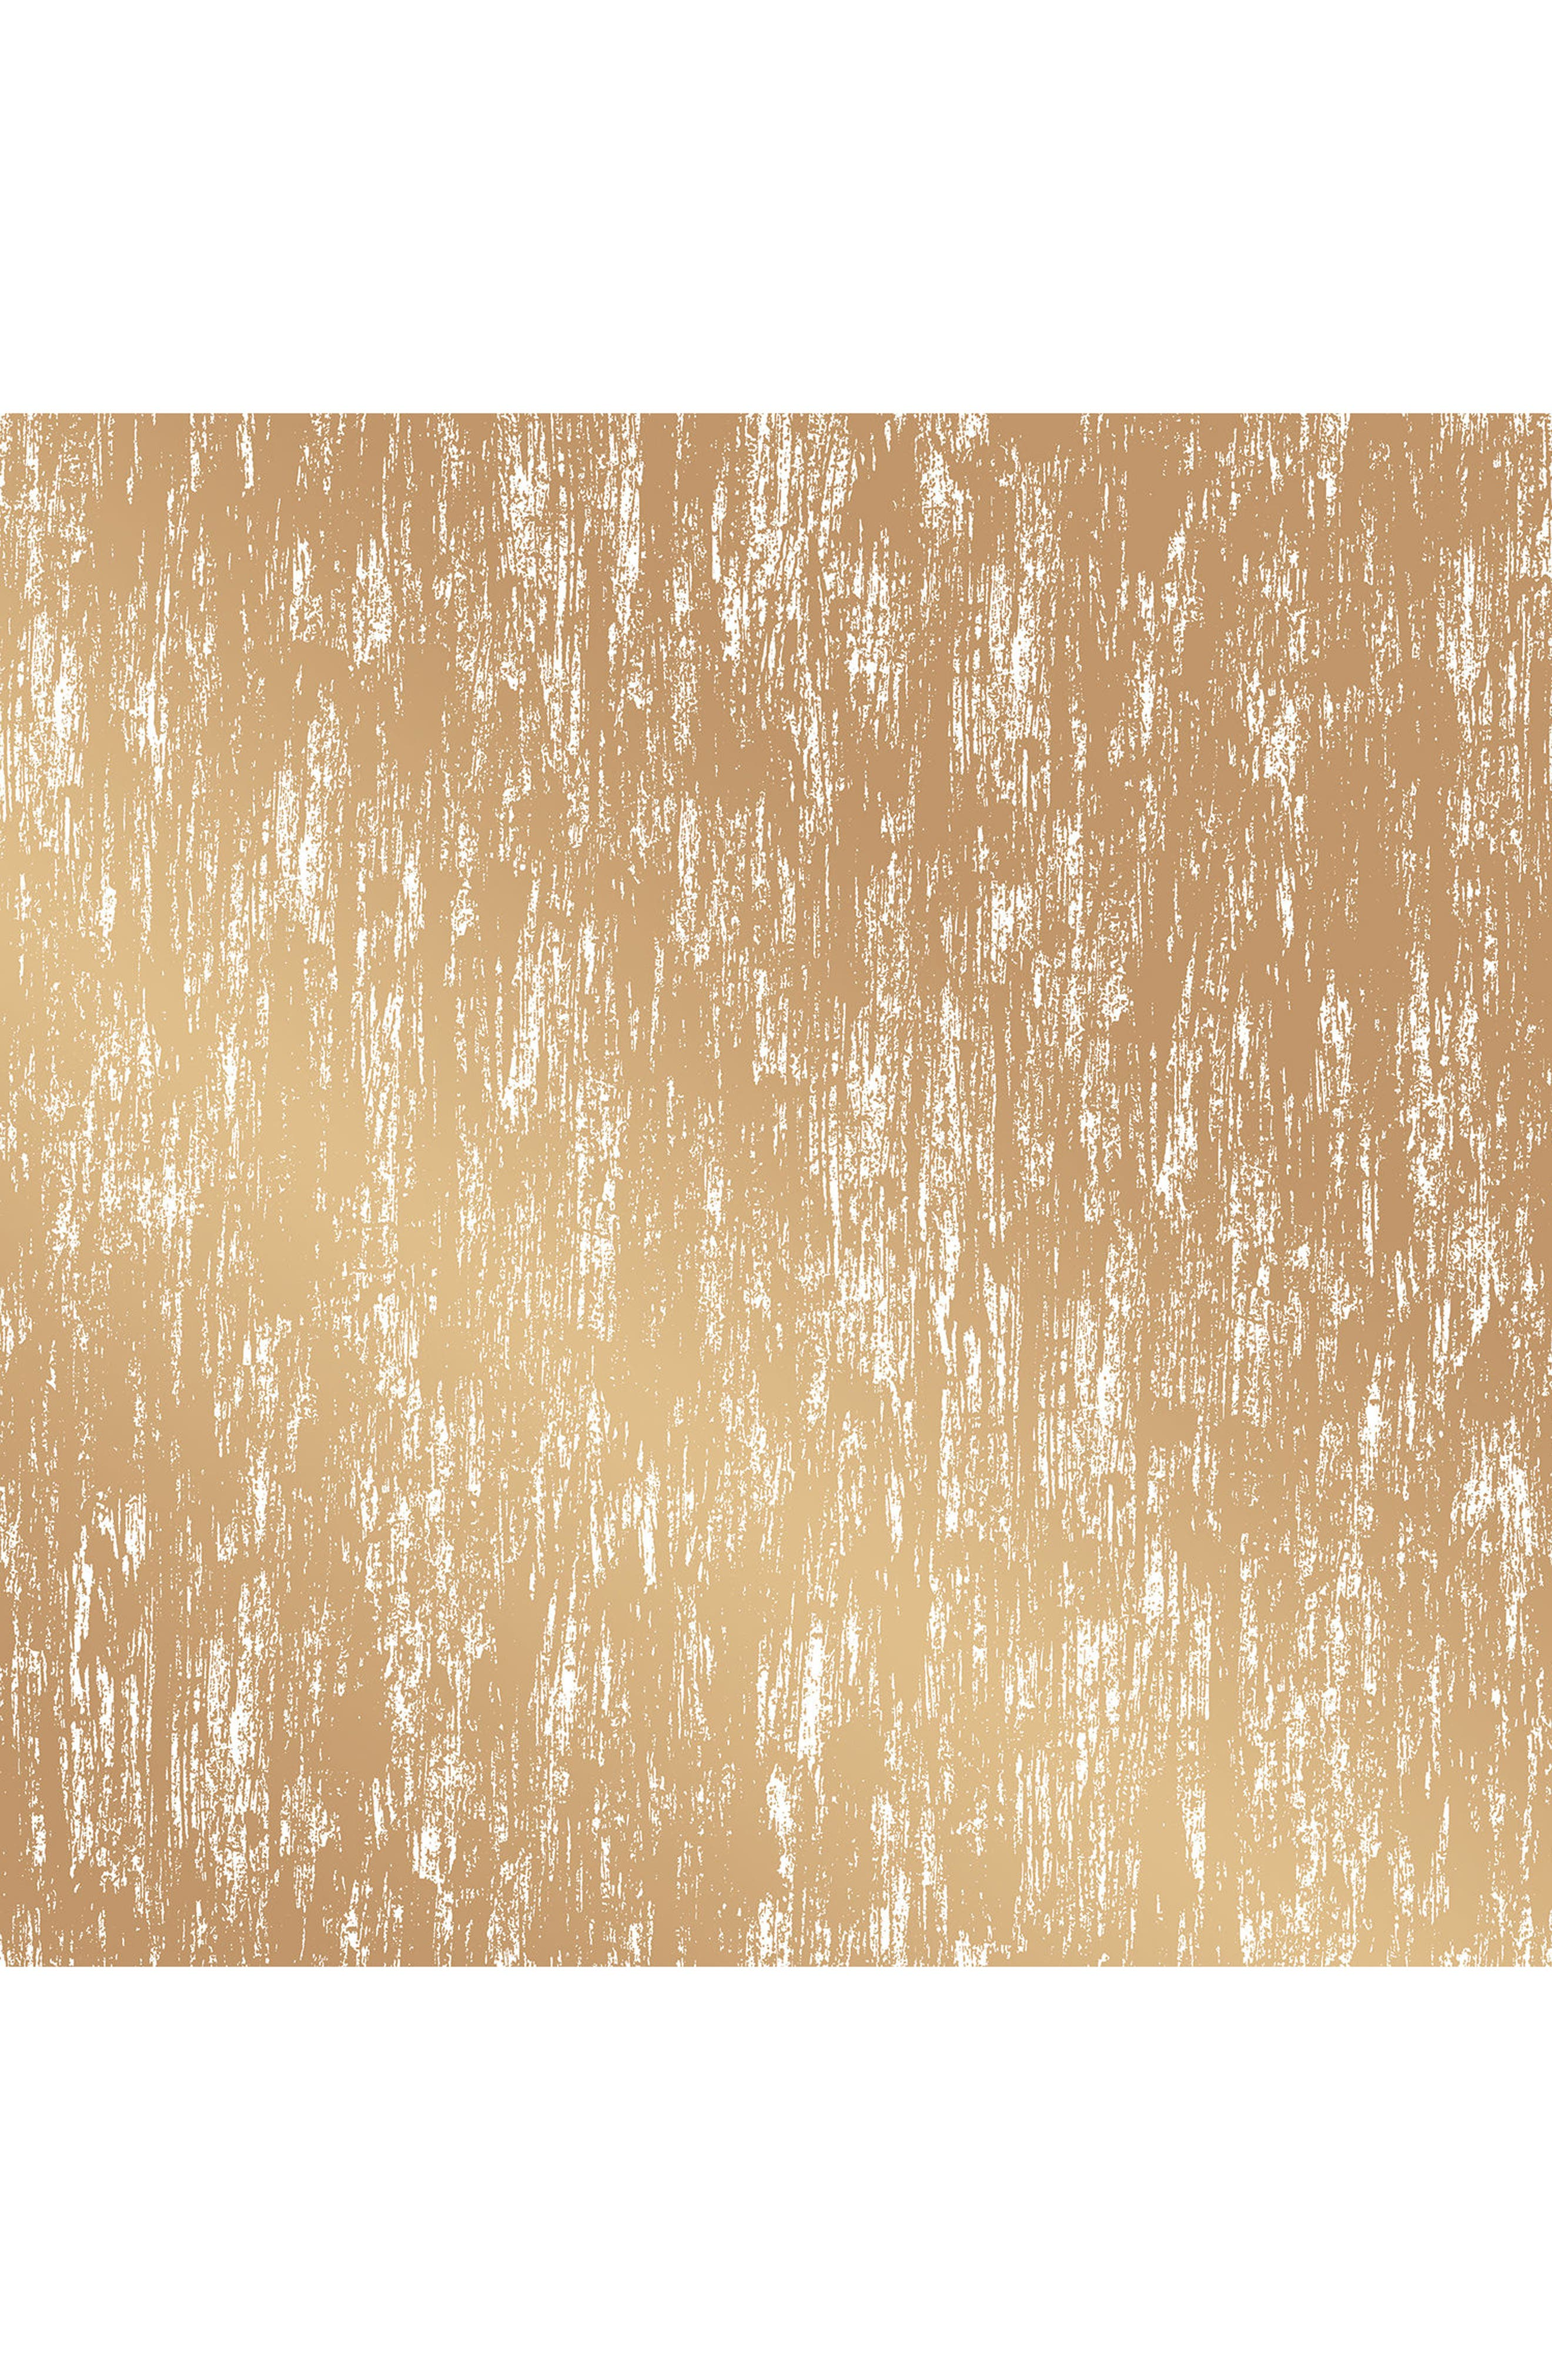 Gold Leaf Self Adhesive Vinyl Wallpaper,                         Main,                         color, Gold